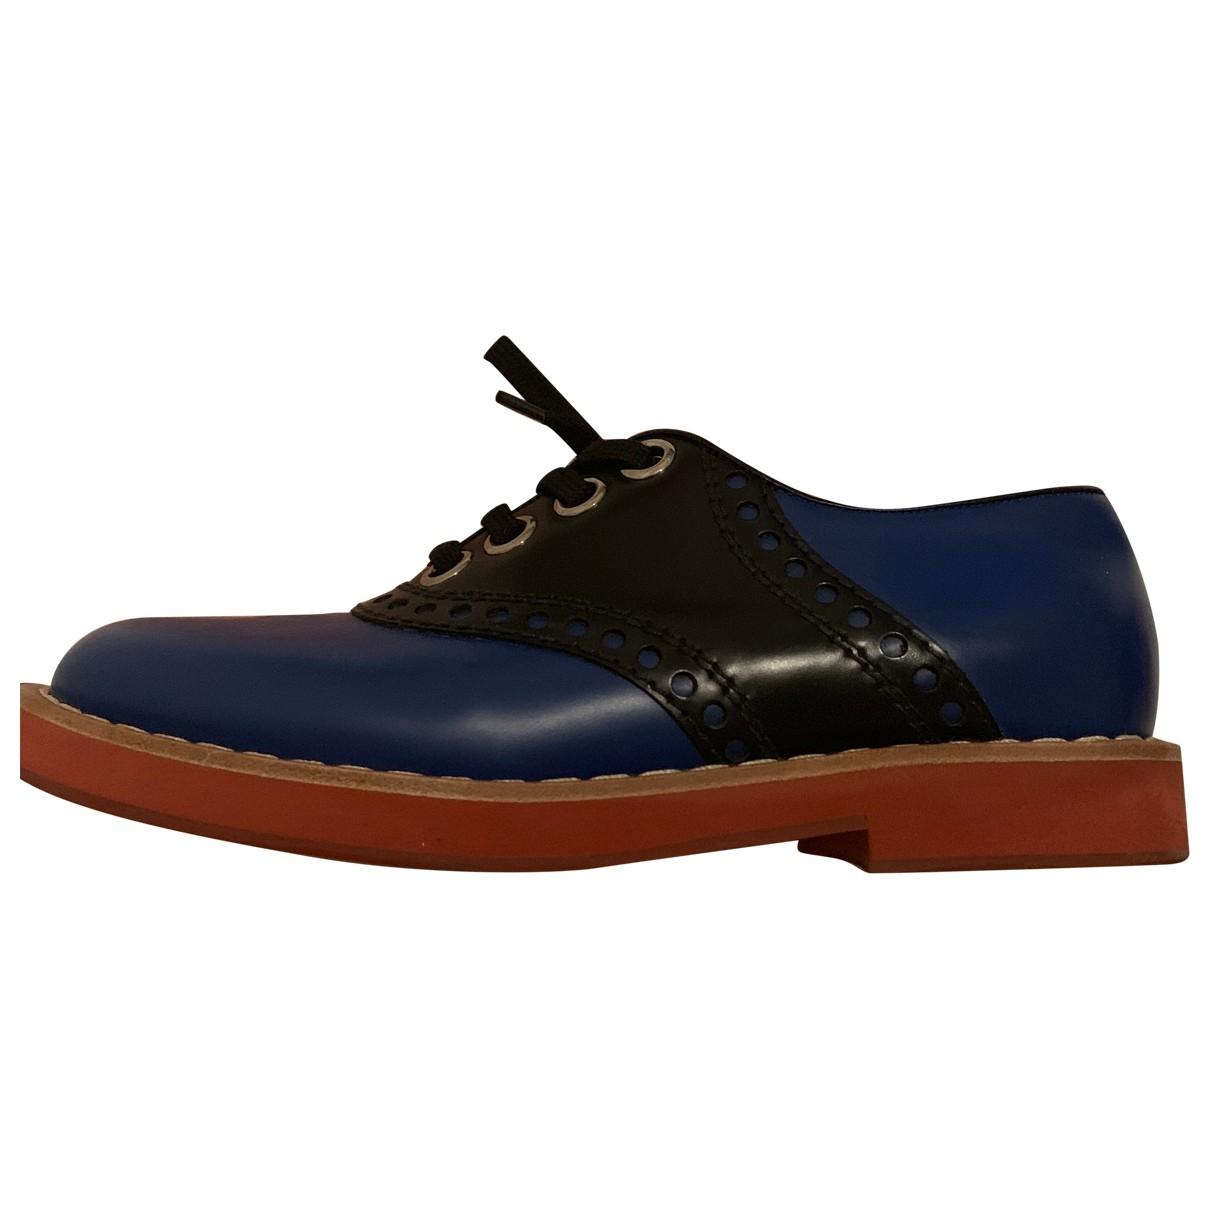 Miu Miu \N Blue Leather Flats for Women 39 IT